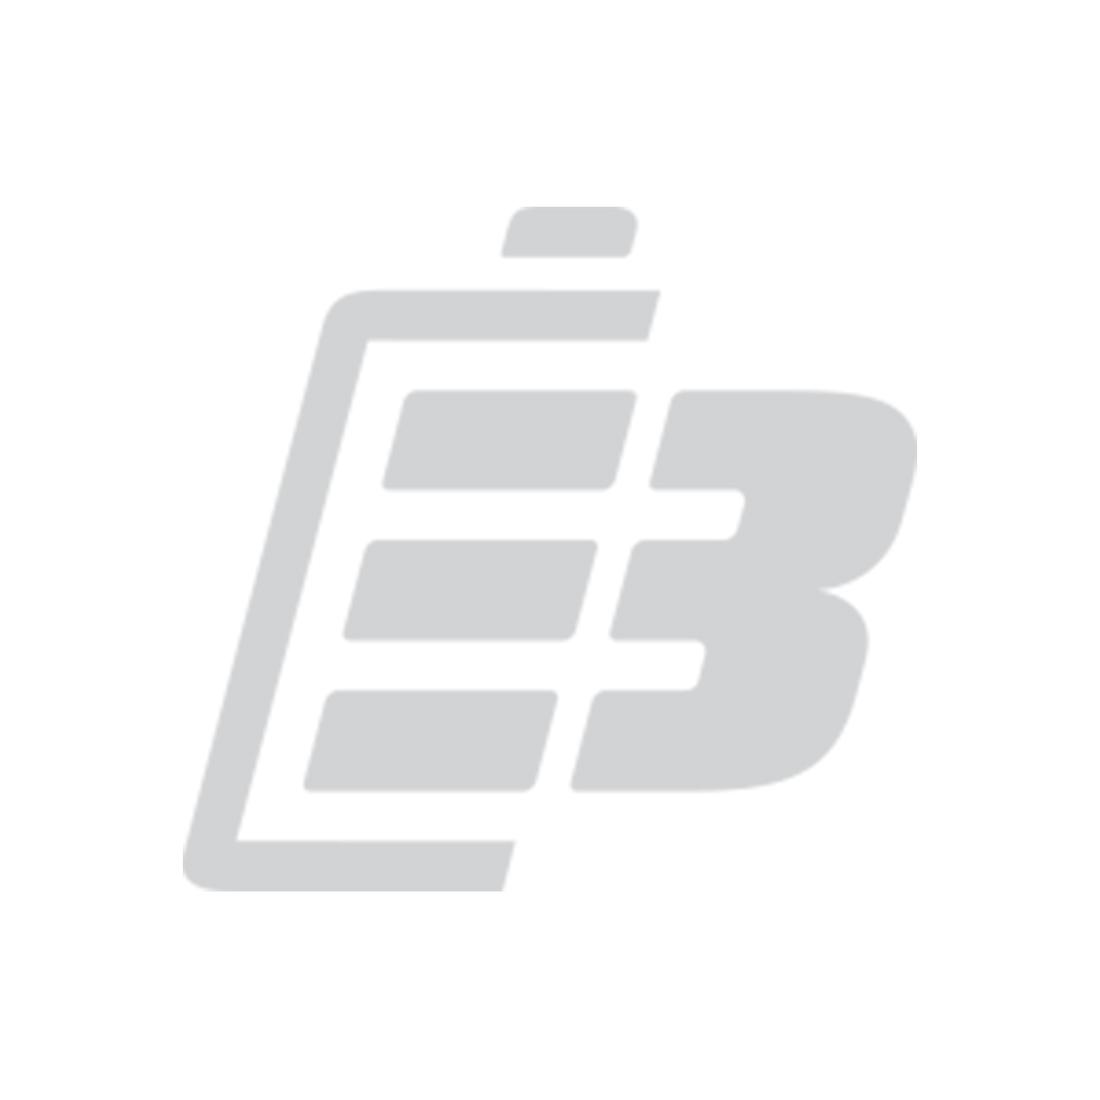 Fenix HL18R LED Headlamp